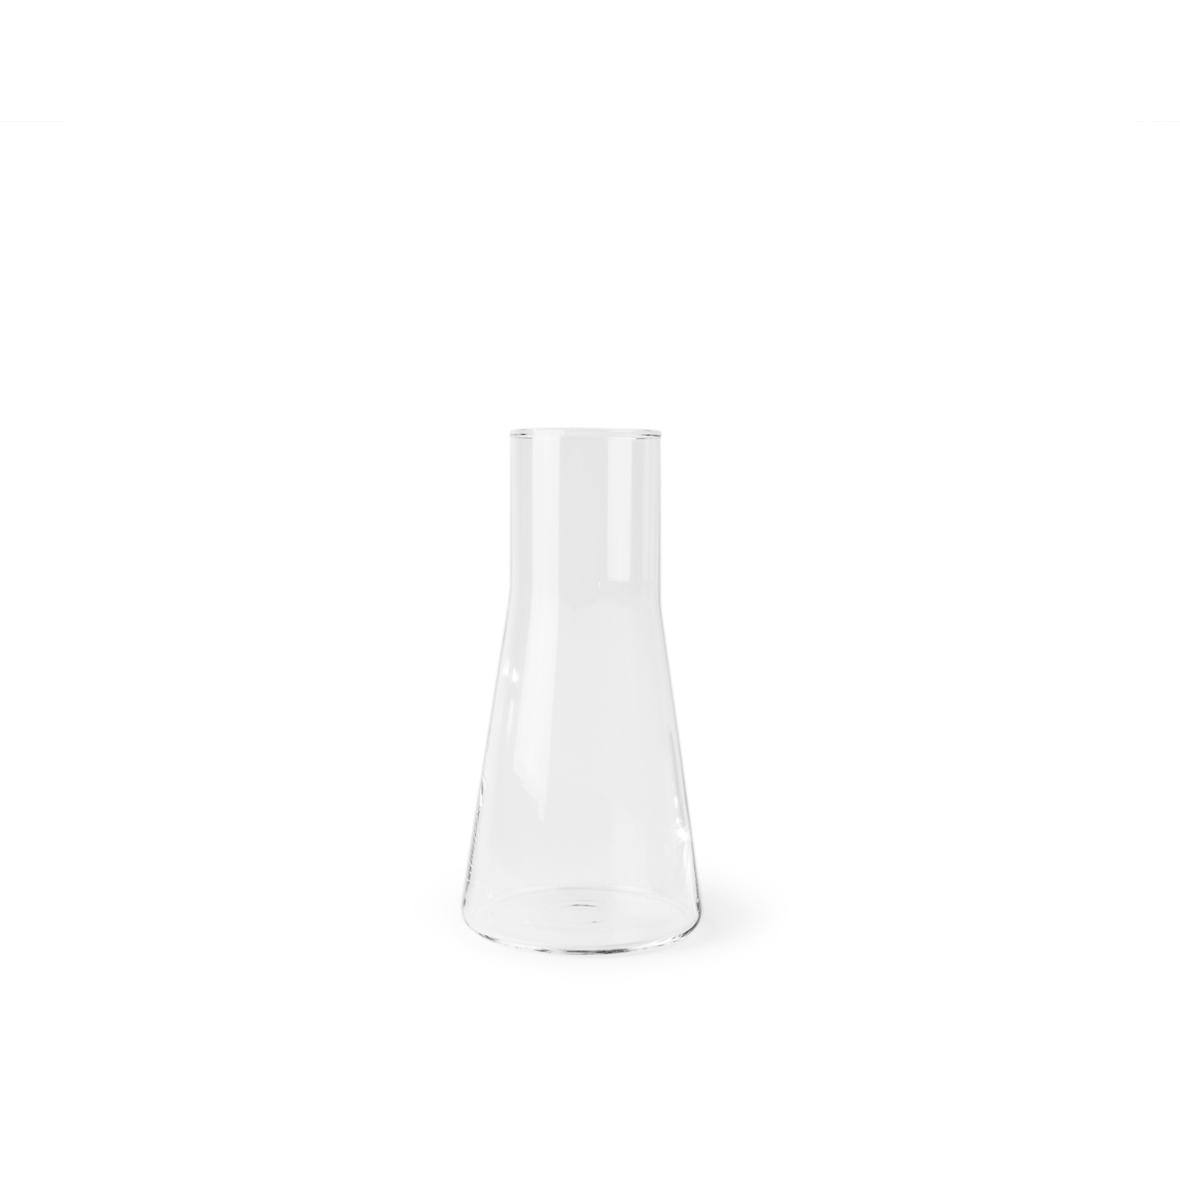 vase durstloescher mini fidea design